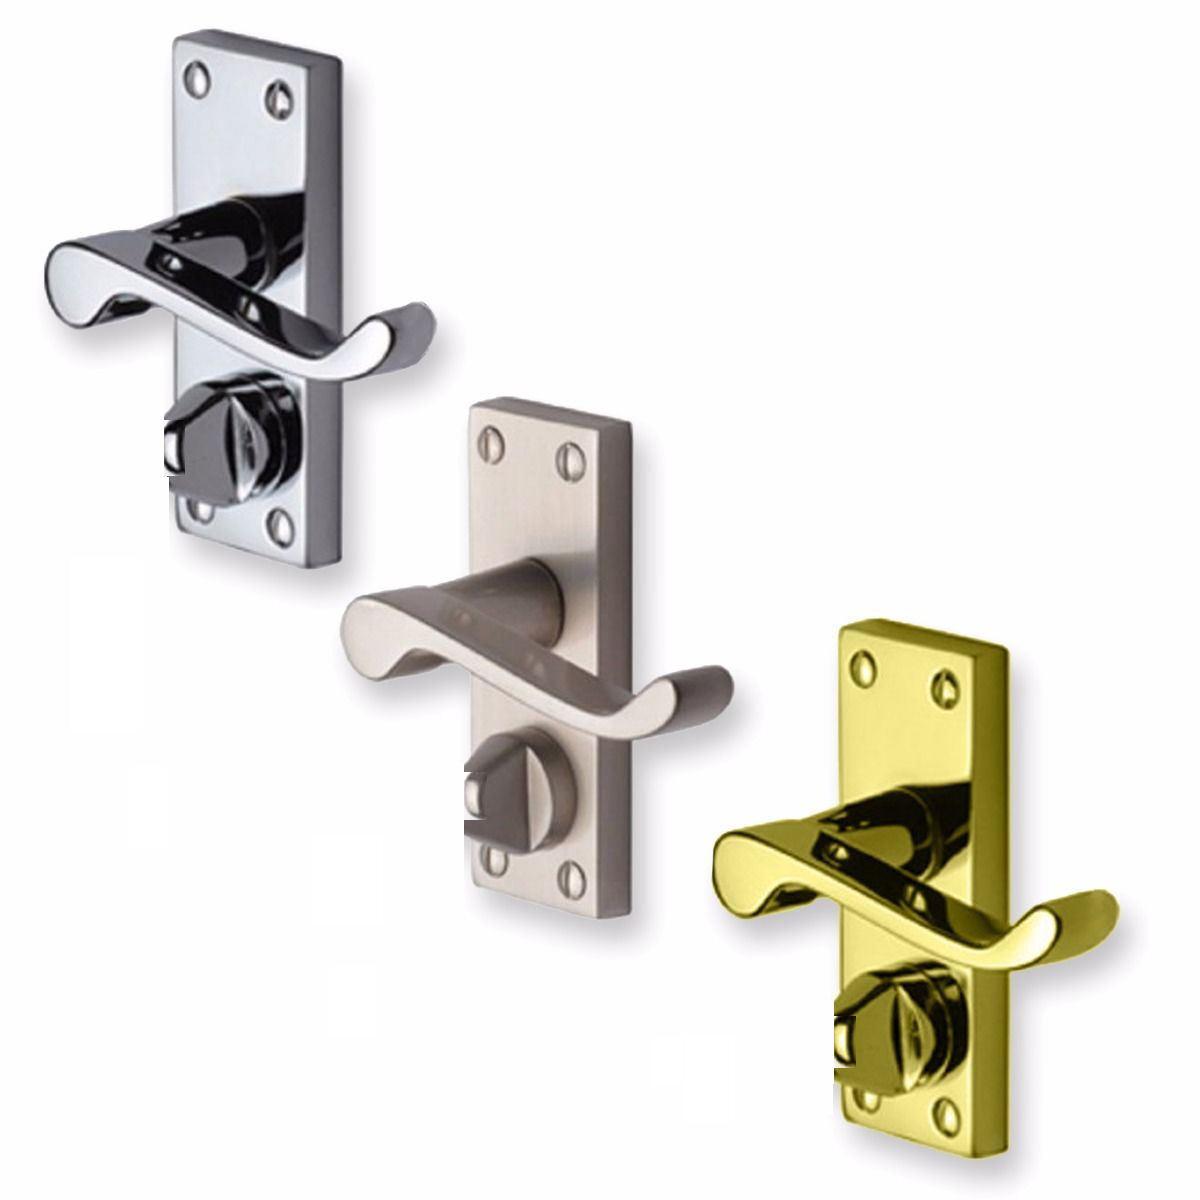 CHROME Finish D12 Privacy Lock PAIR of Bathroom//WC Lever LOCK Door Handle